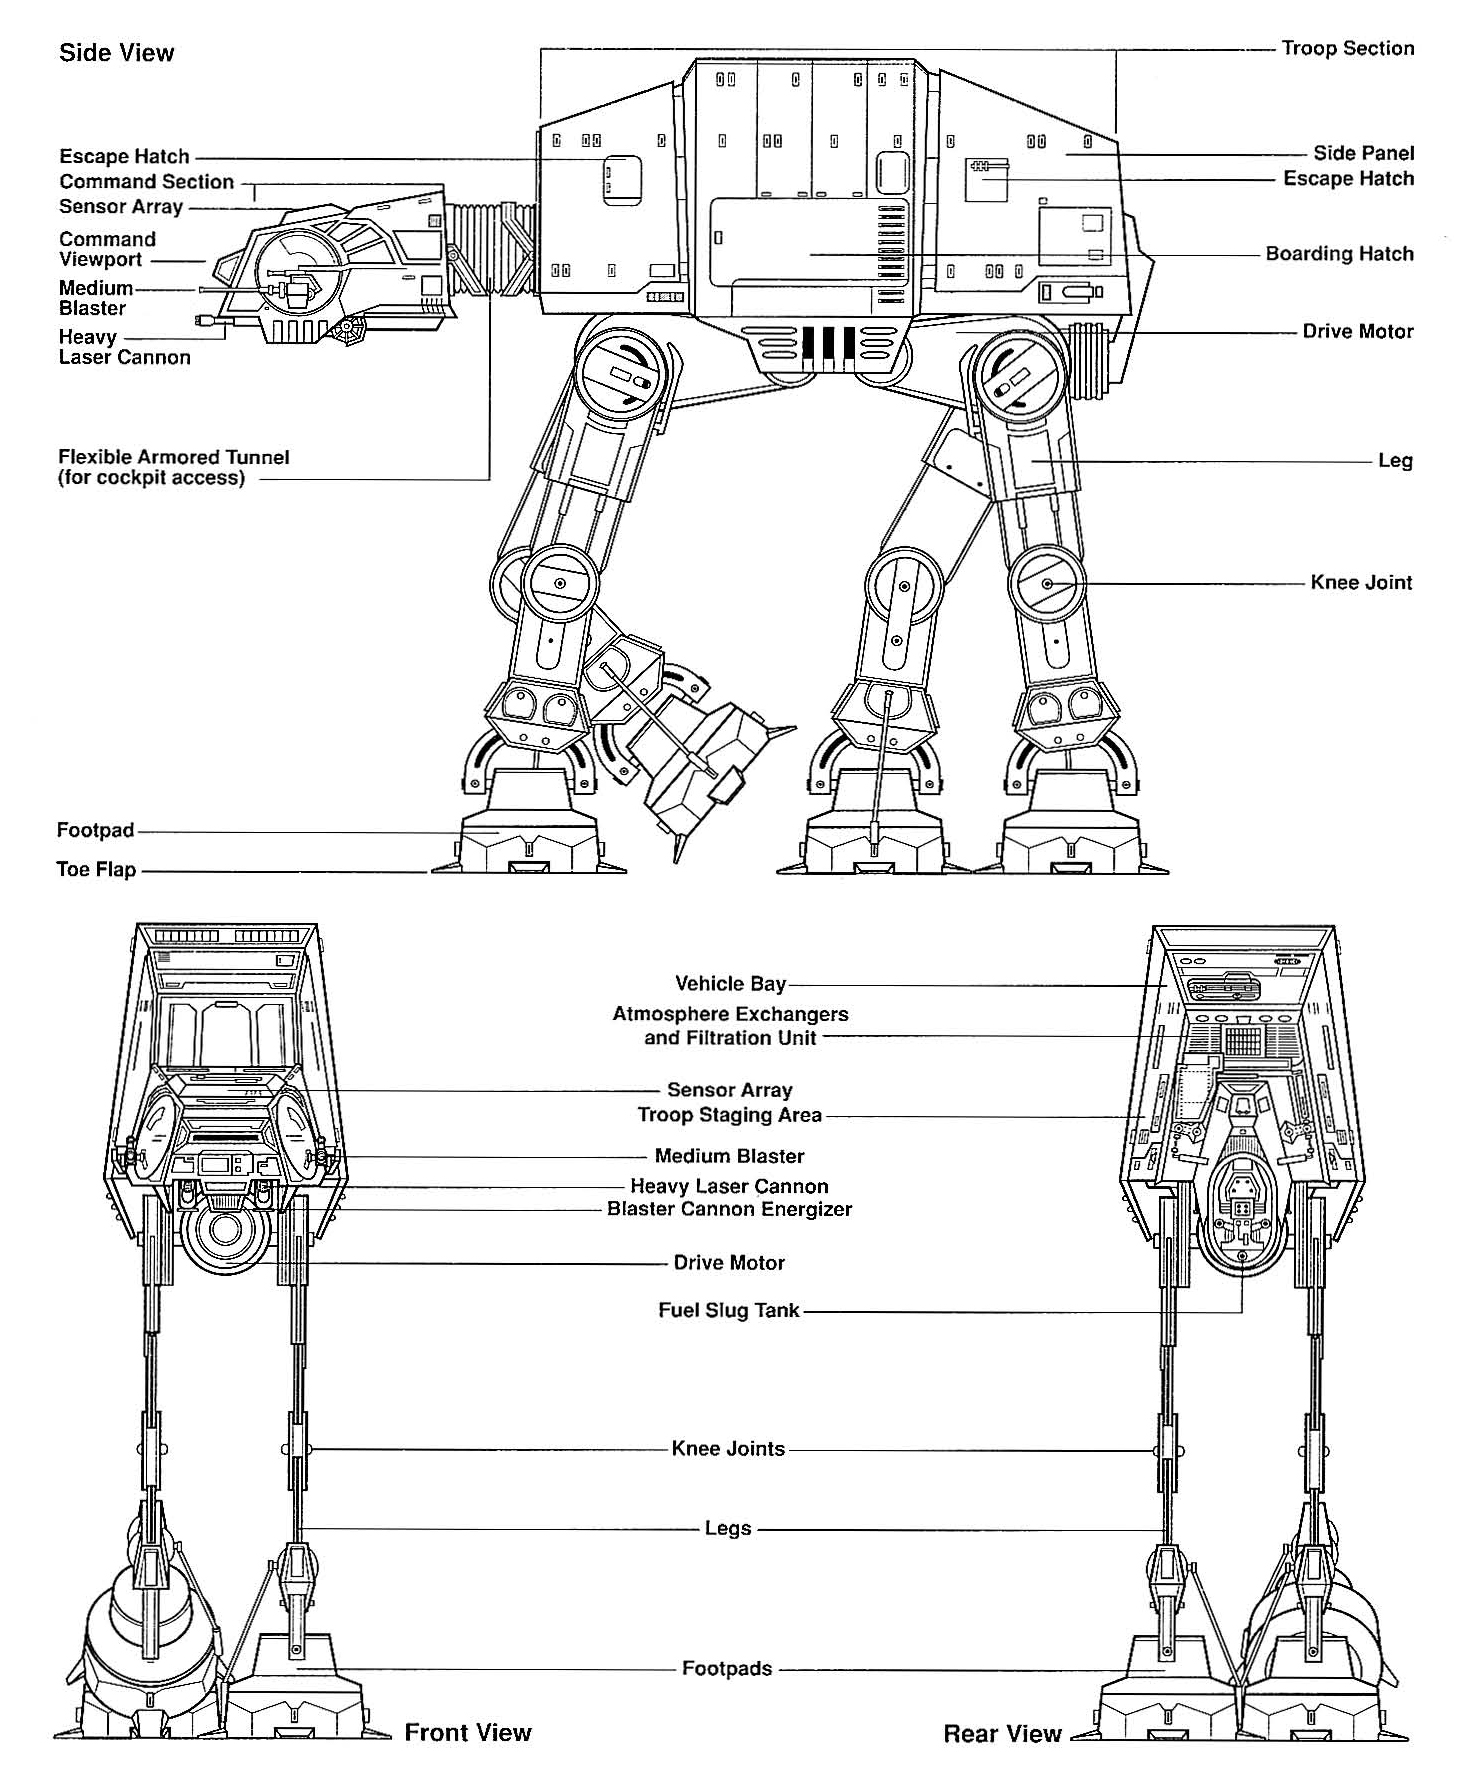 All Terrain Armored Transport | Wookieepedia | FANDOM powered by Wikia